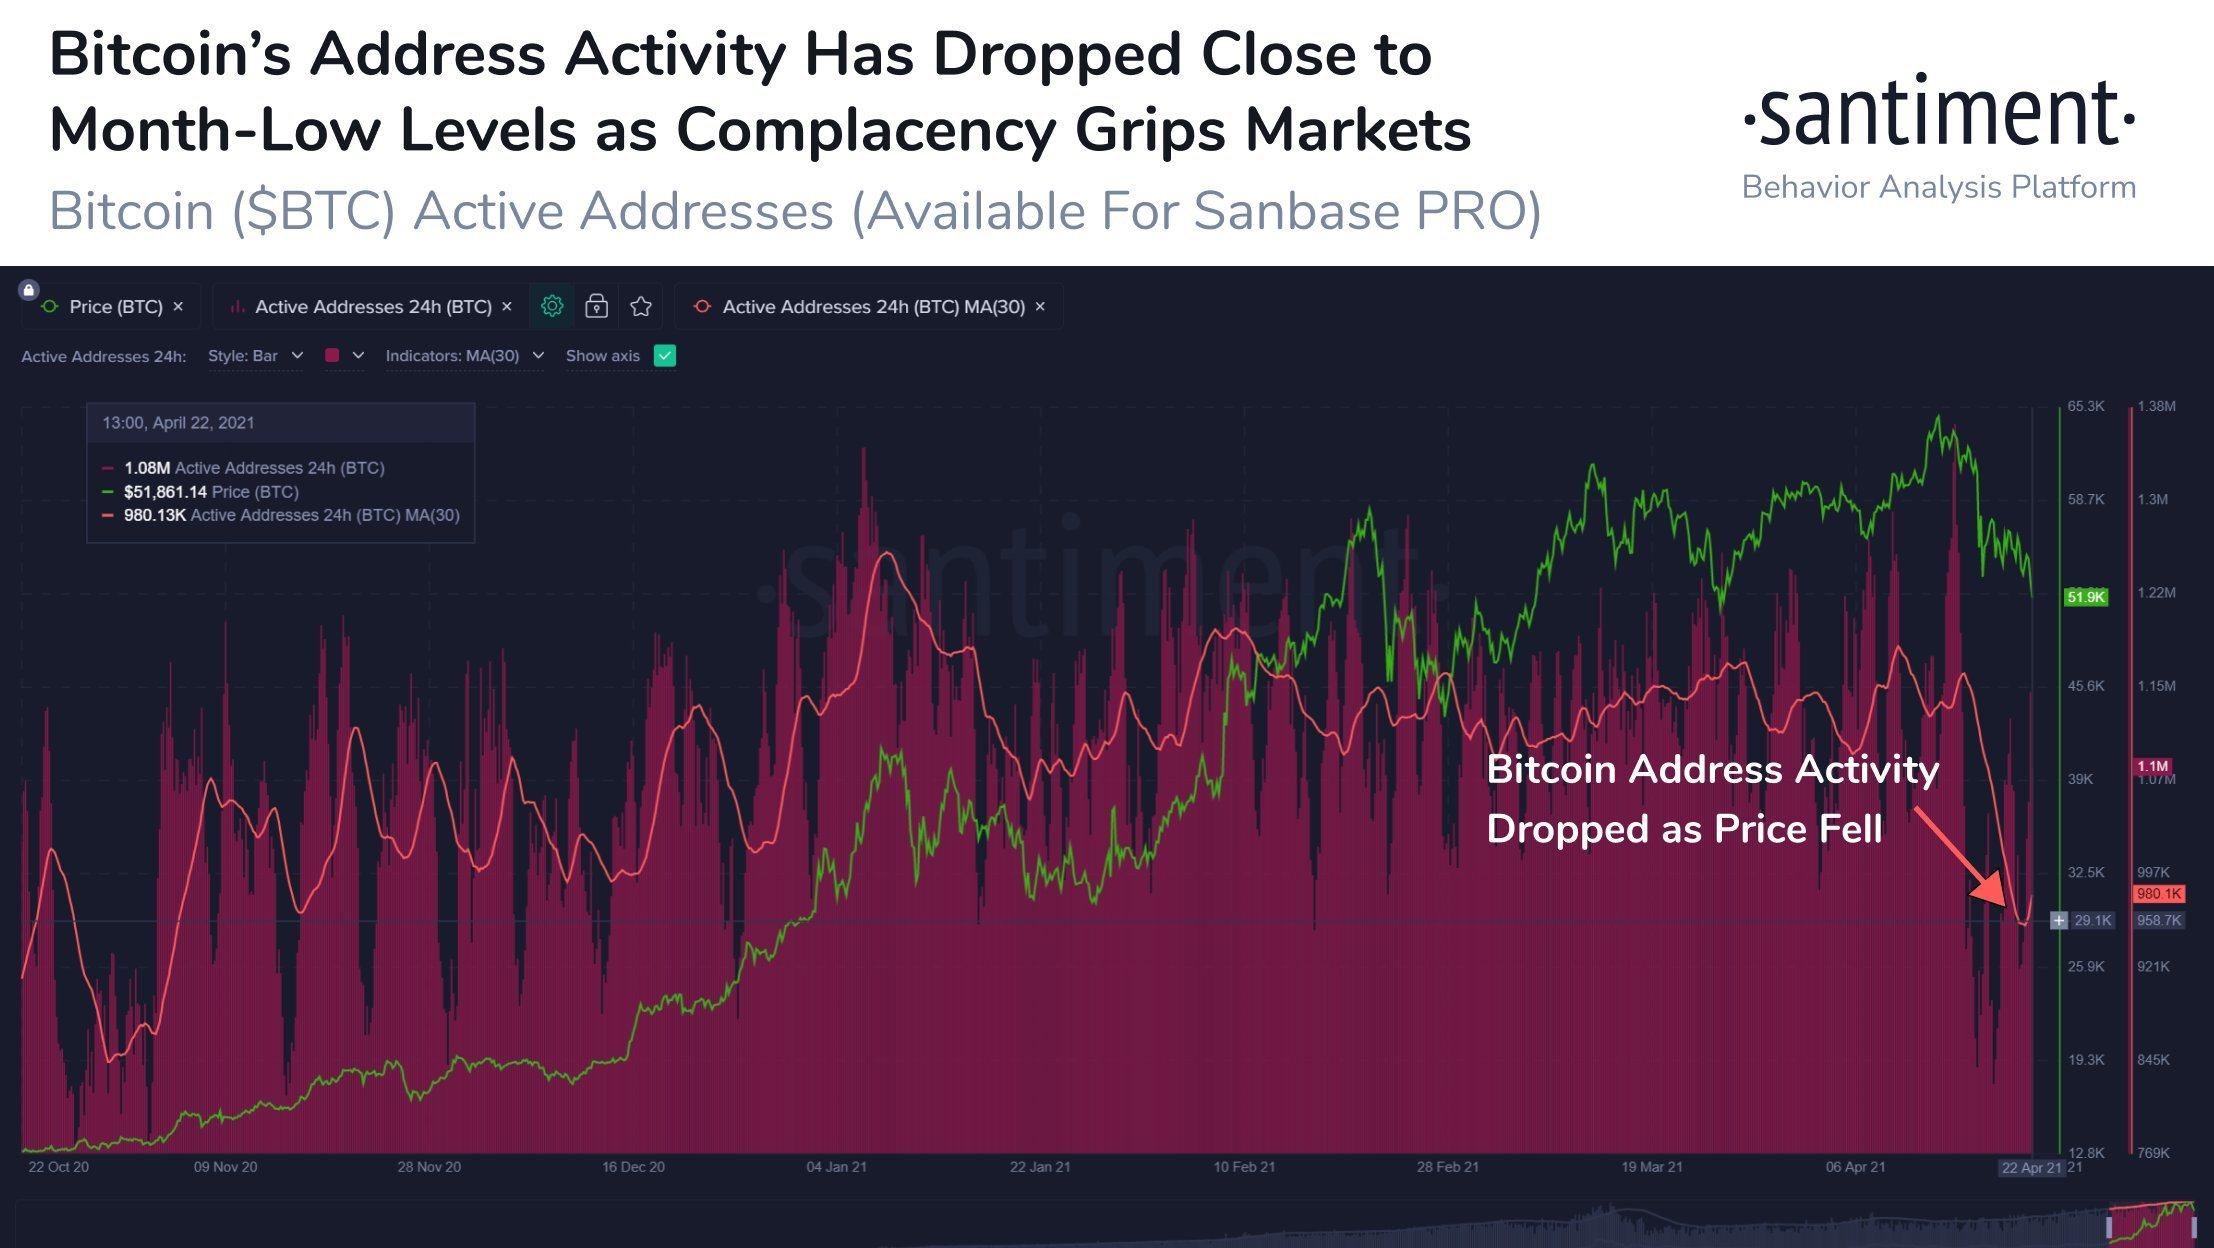 Activité d'adresse Bitcoin